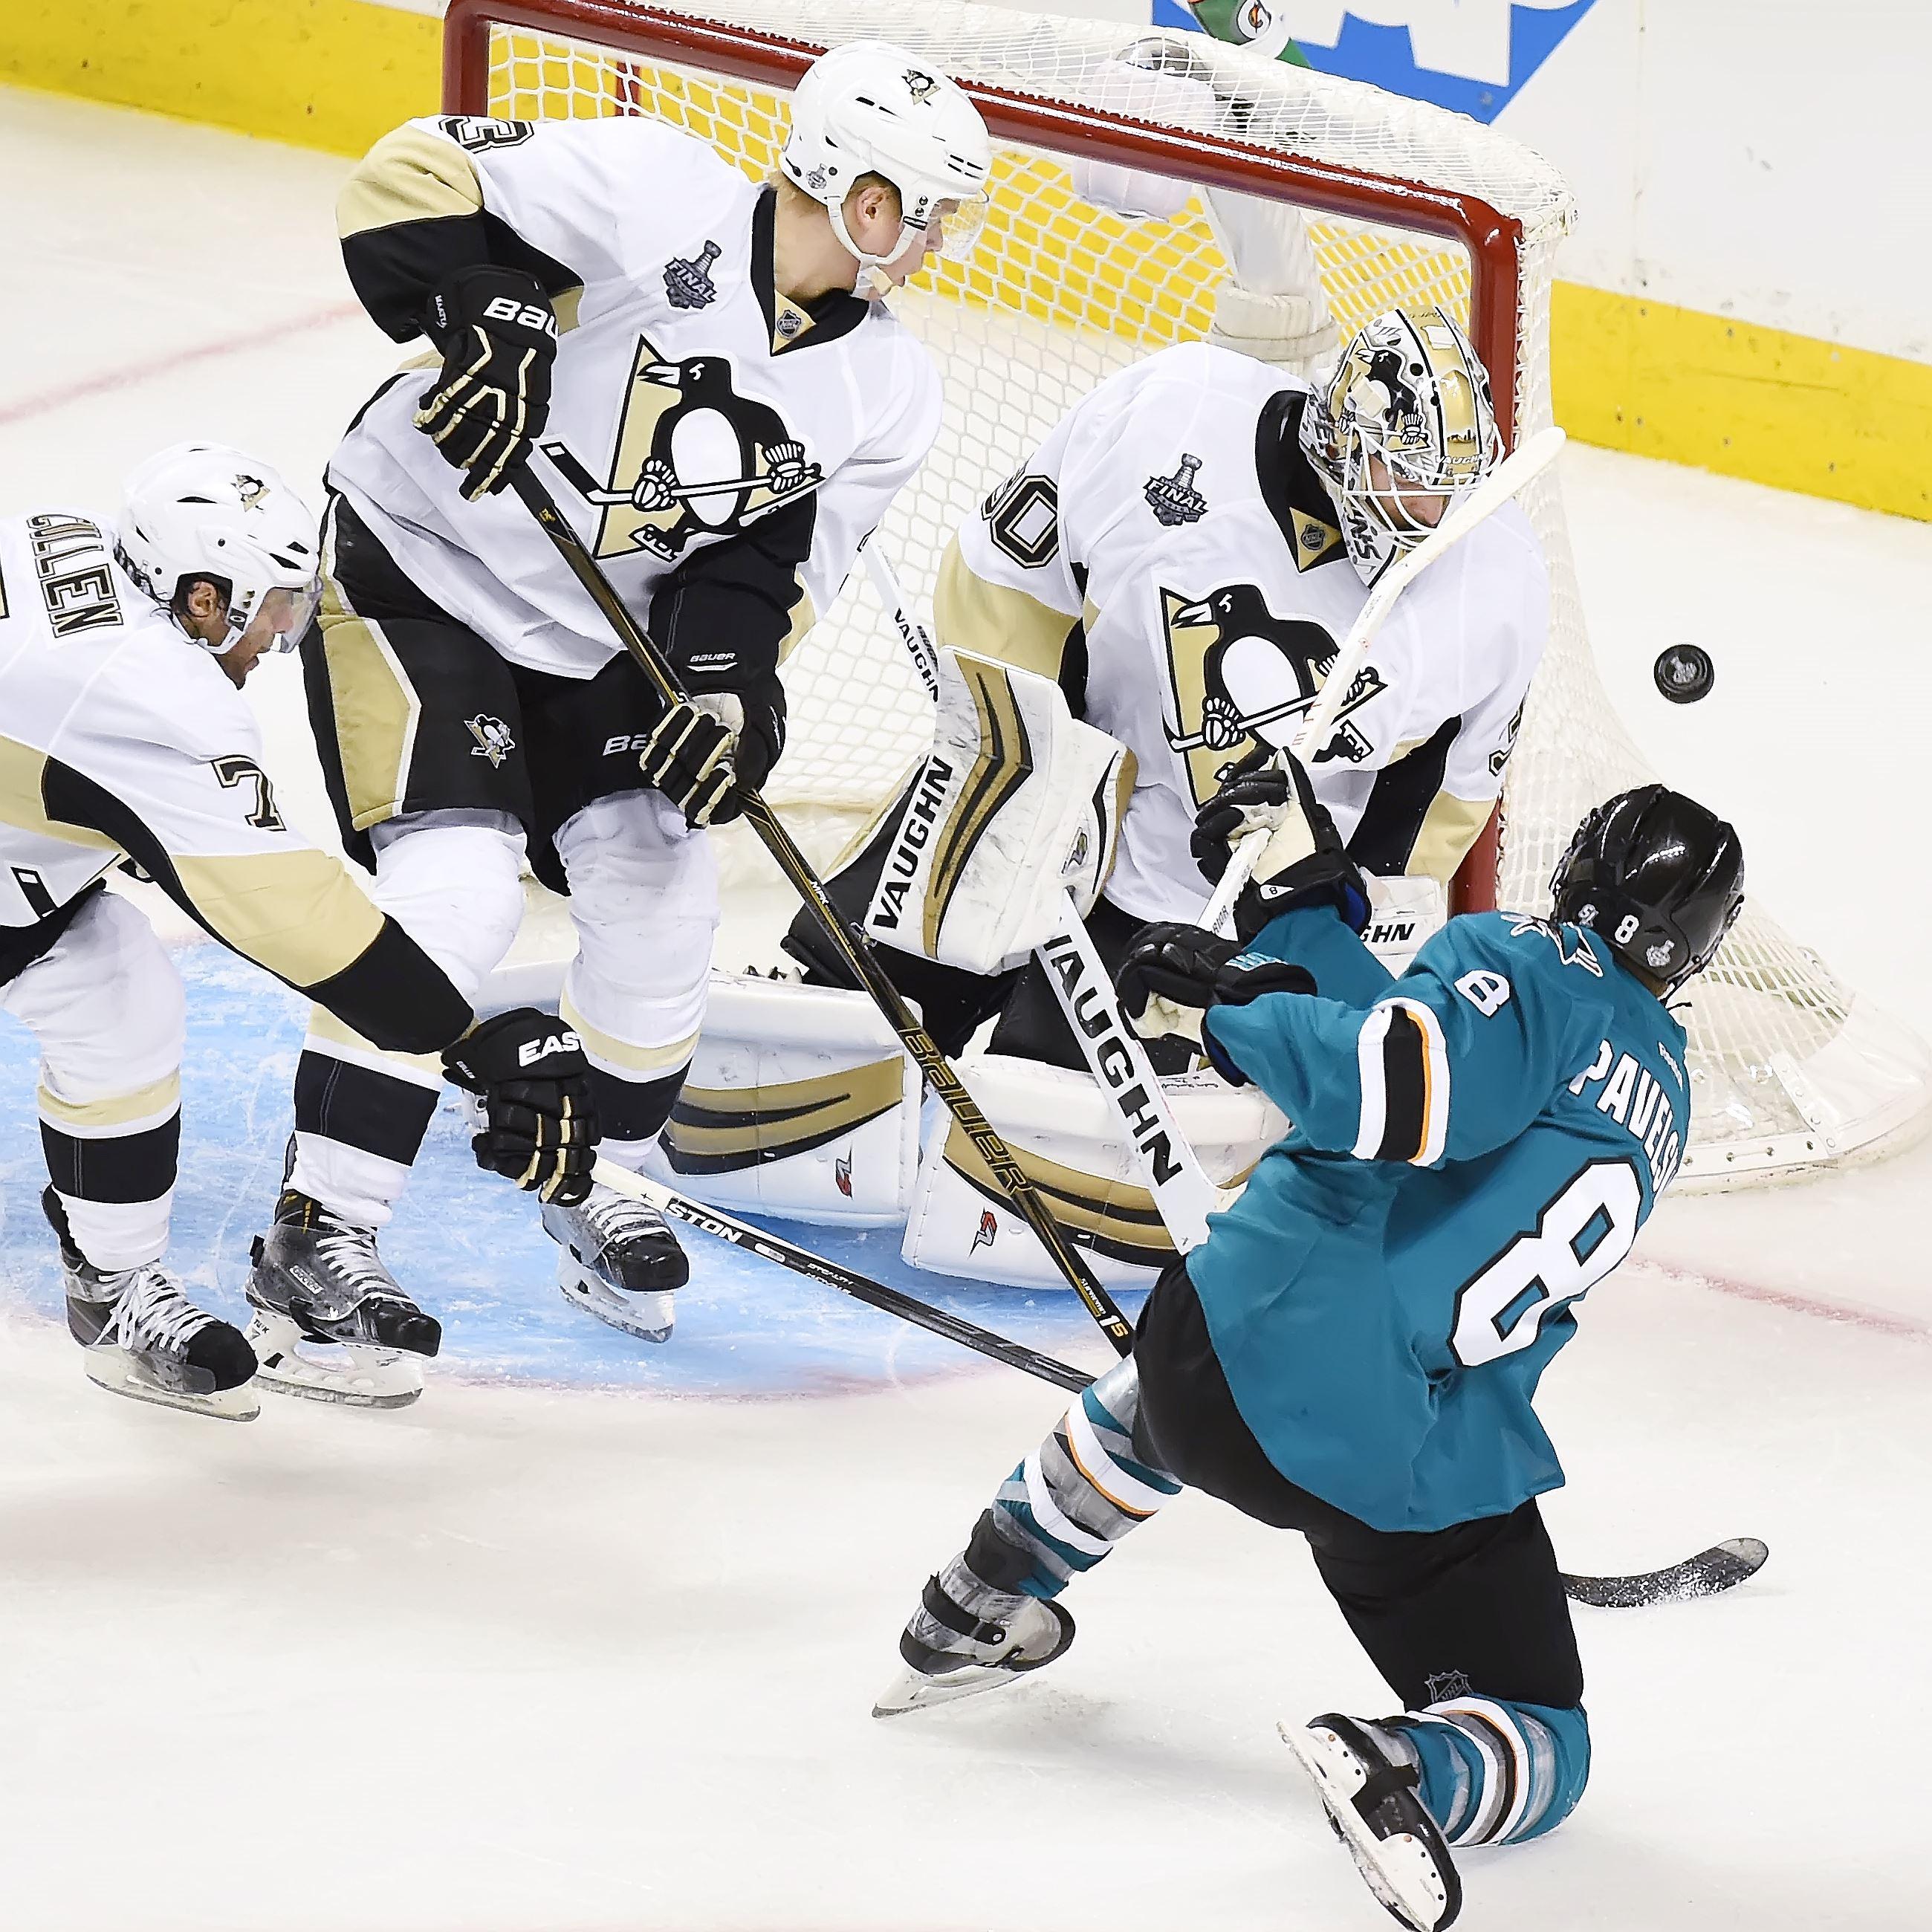 Blocking shots an important asset to Penguins defense